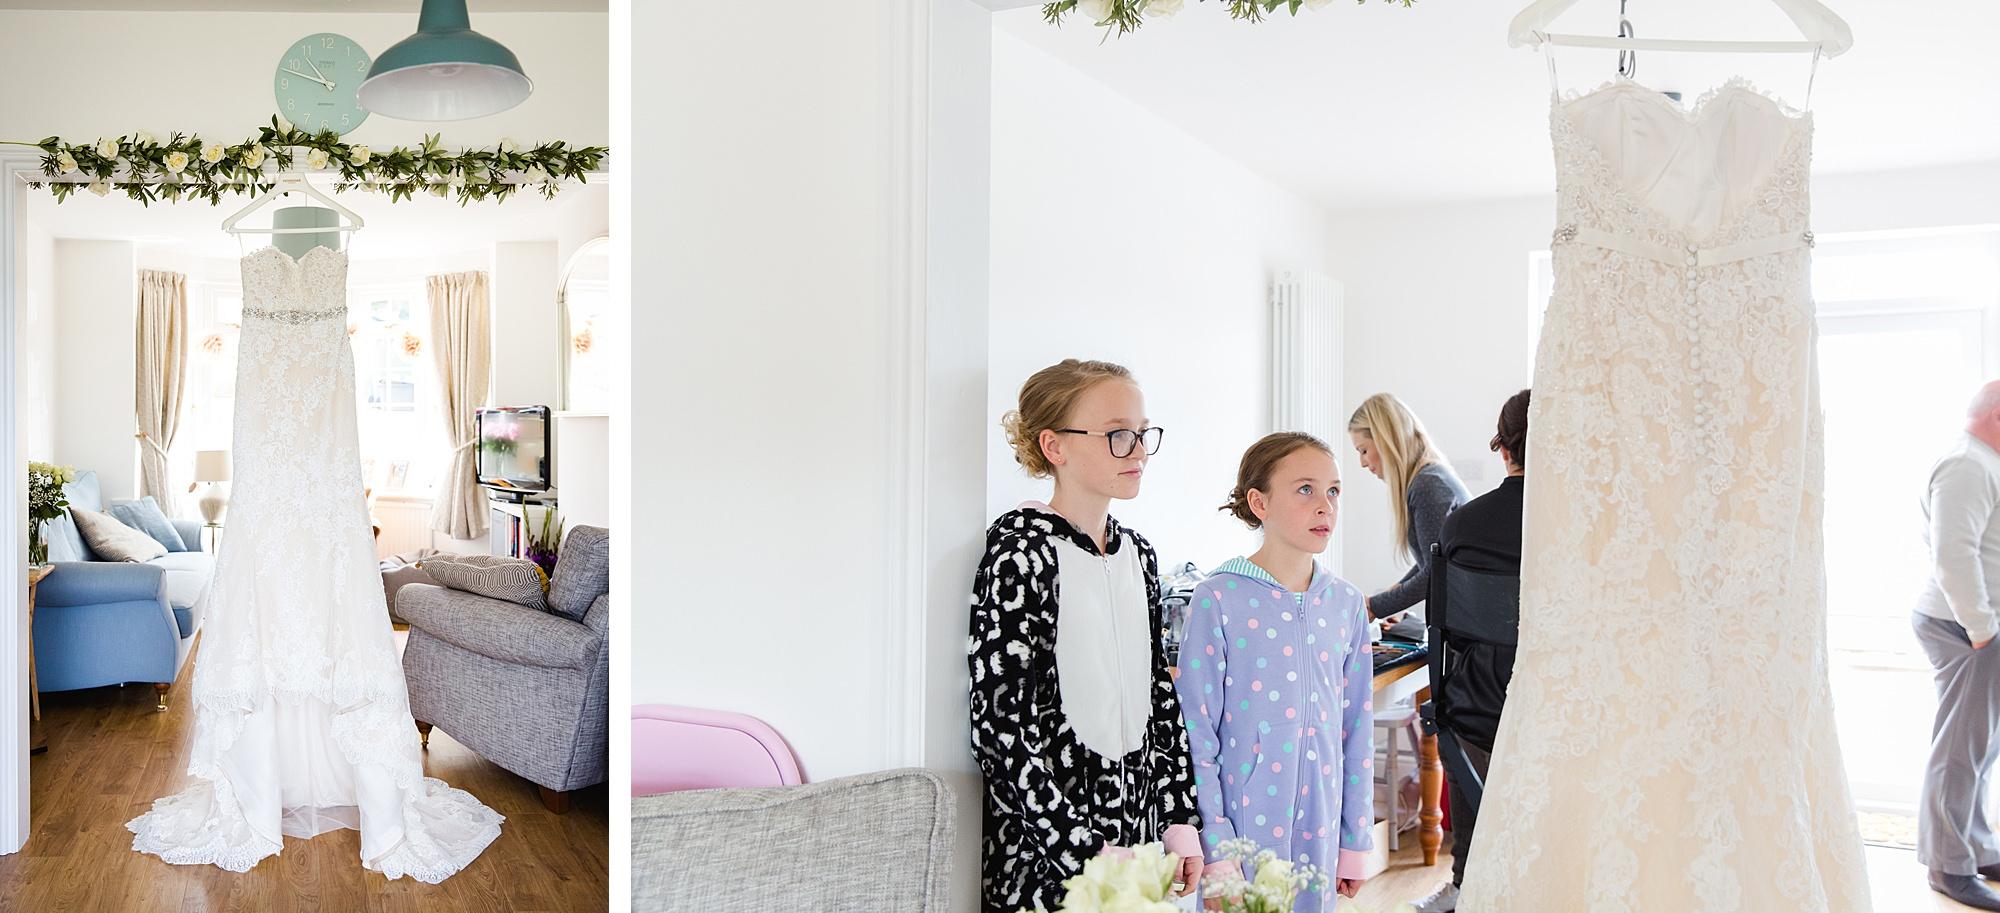 Lillibrooke Manor wedding bride's dress with flower girls